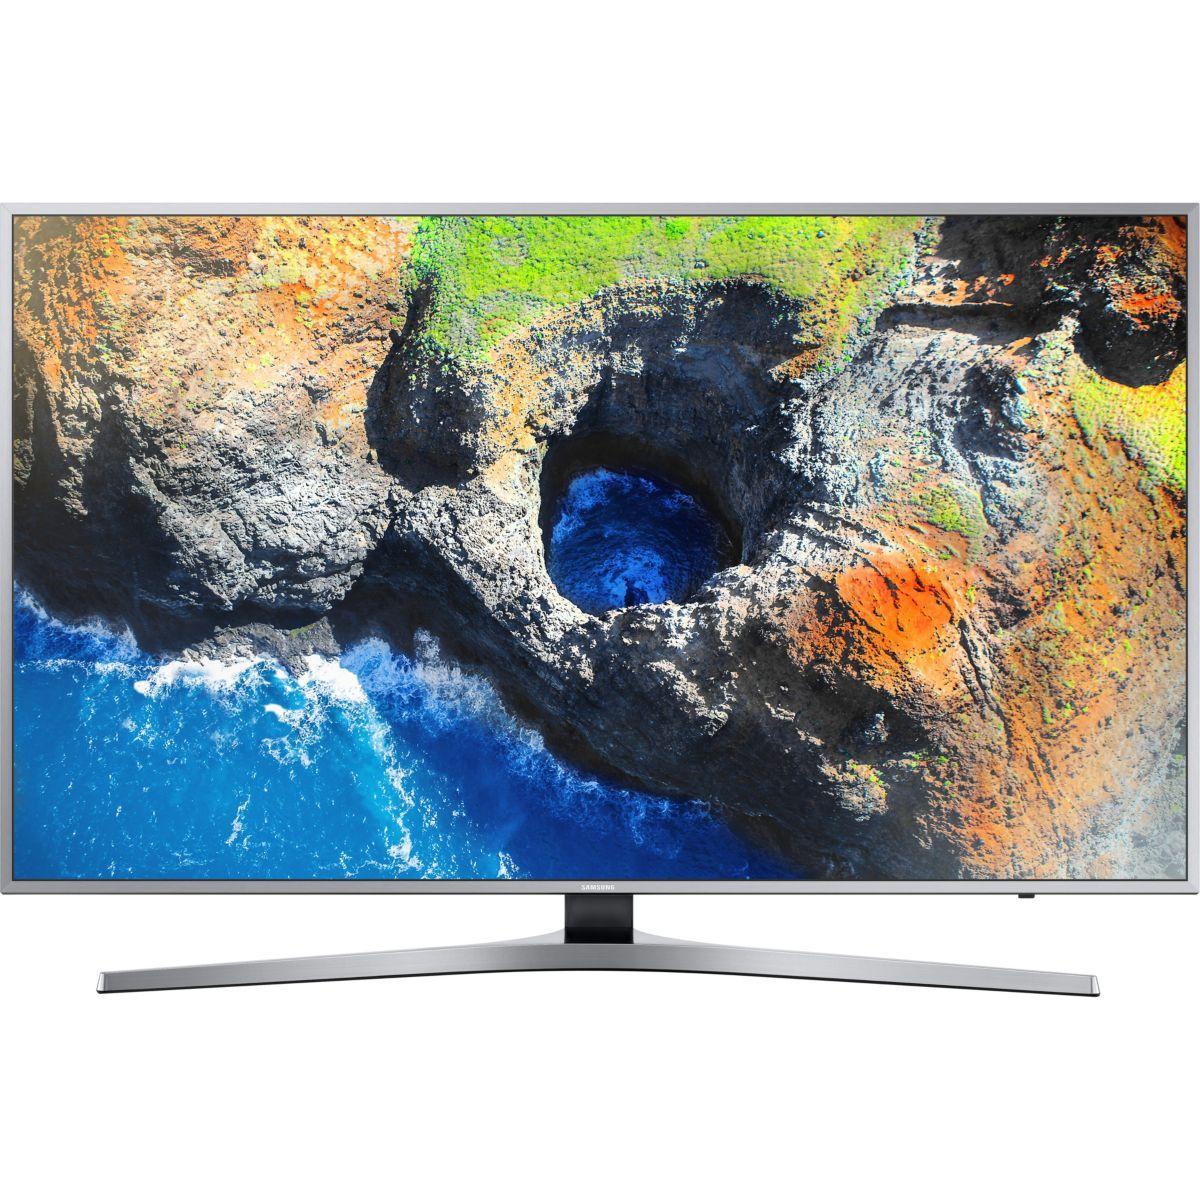 Tv samsung ue40mu6405 4k hdr smart cryst (photo)